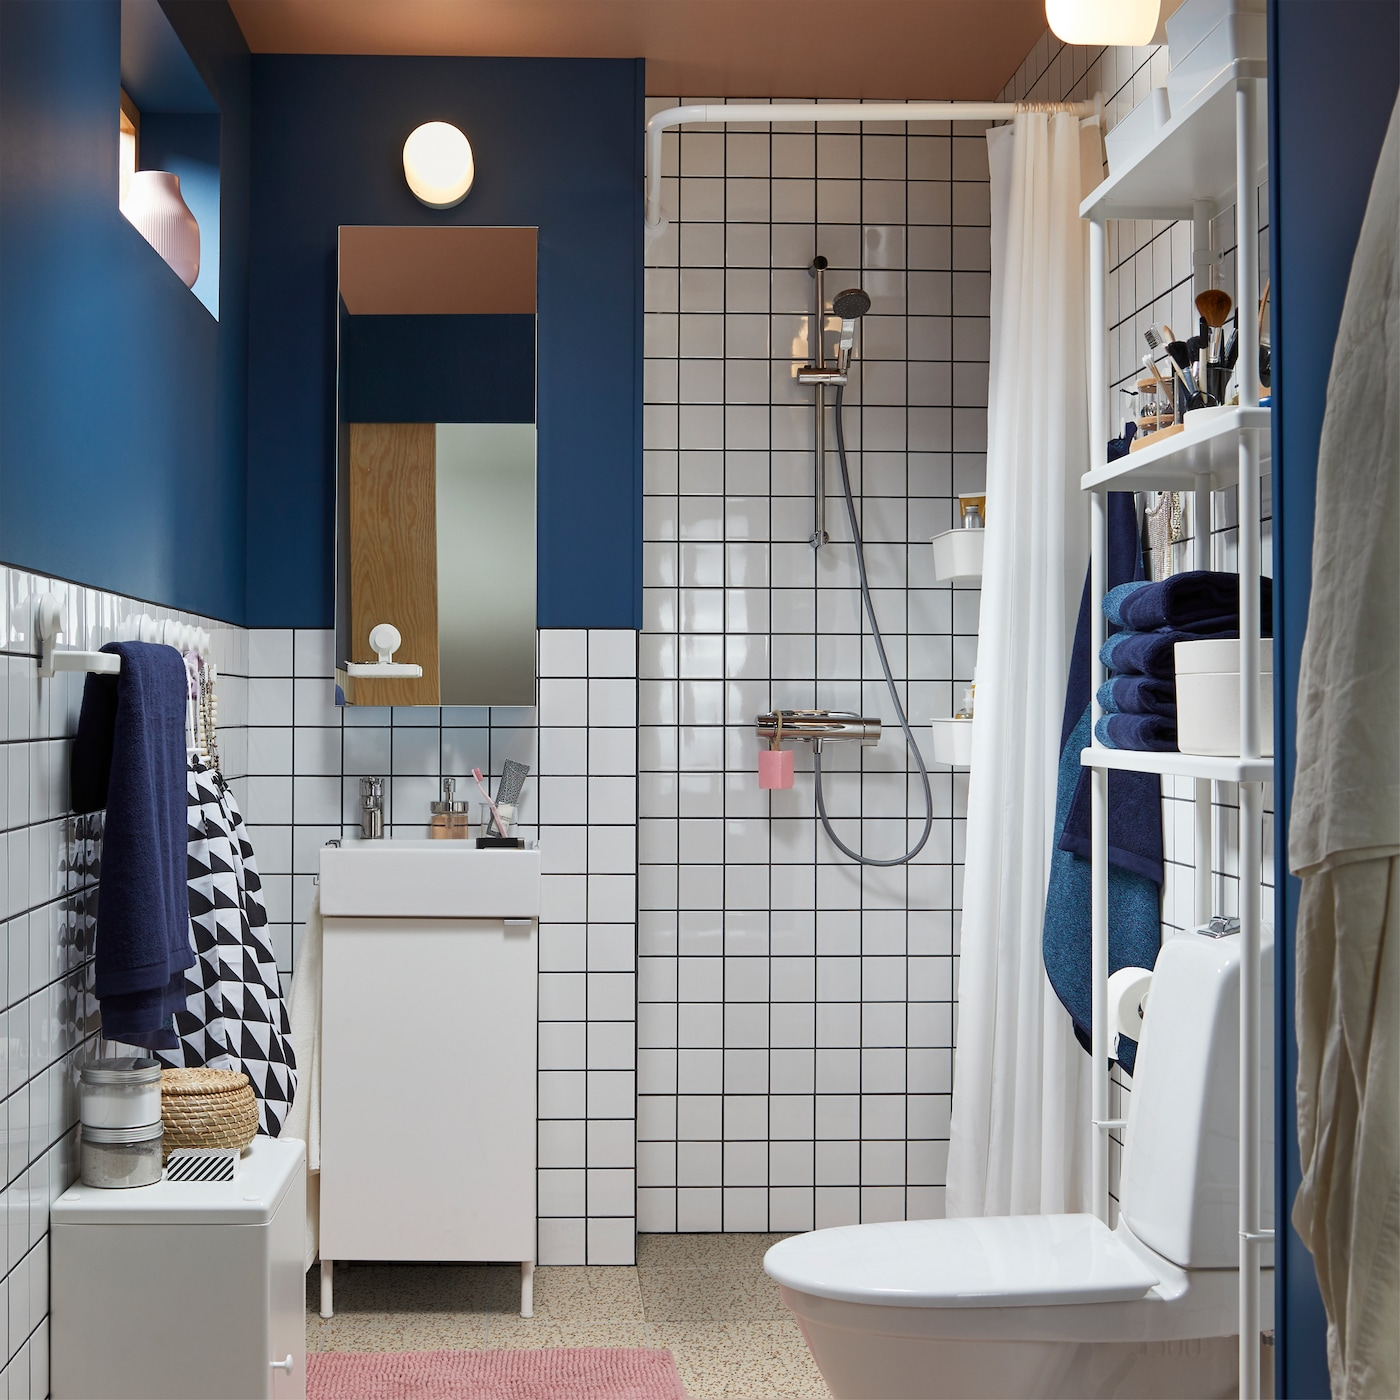 Picture of: Badevaerelsesgalleri Ikea